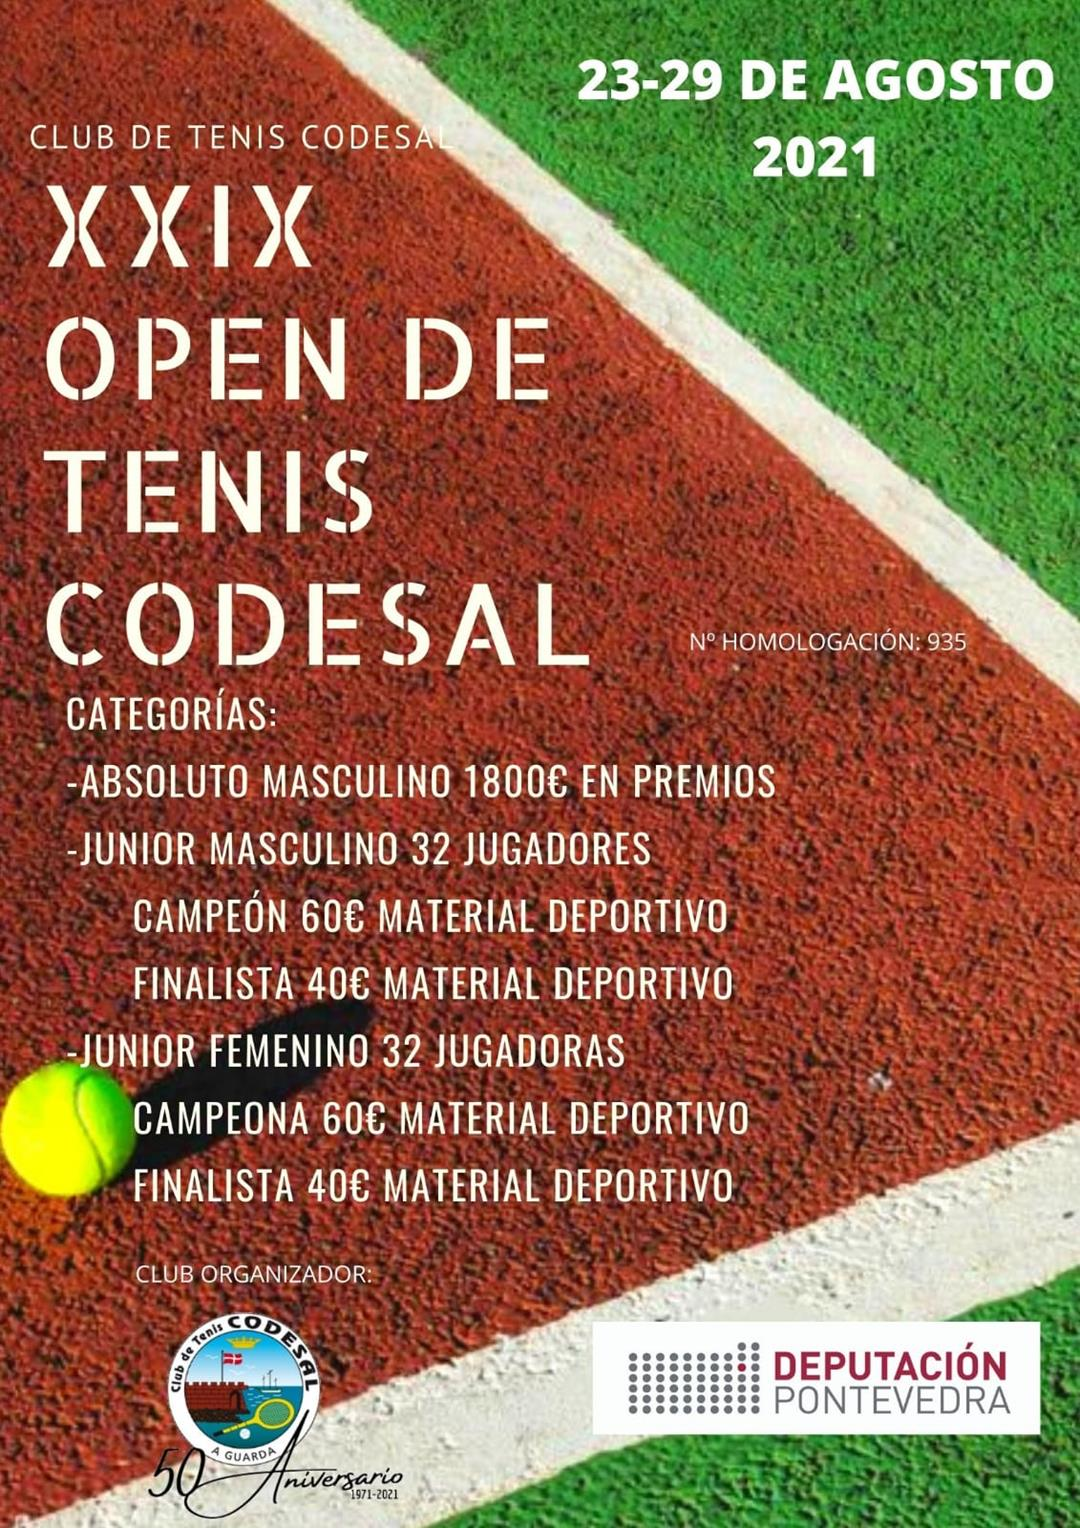 XXIX Open de tenis codesal del 23-29 de agosto 2021